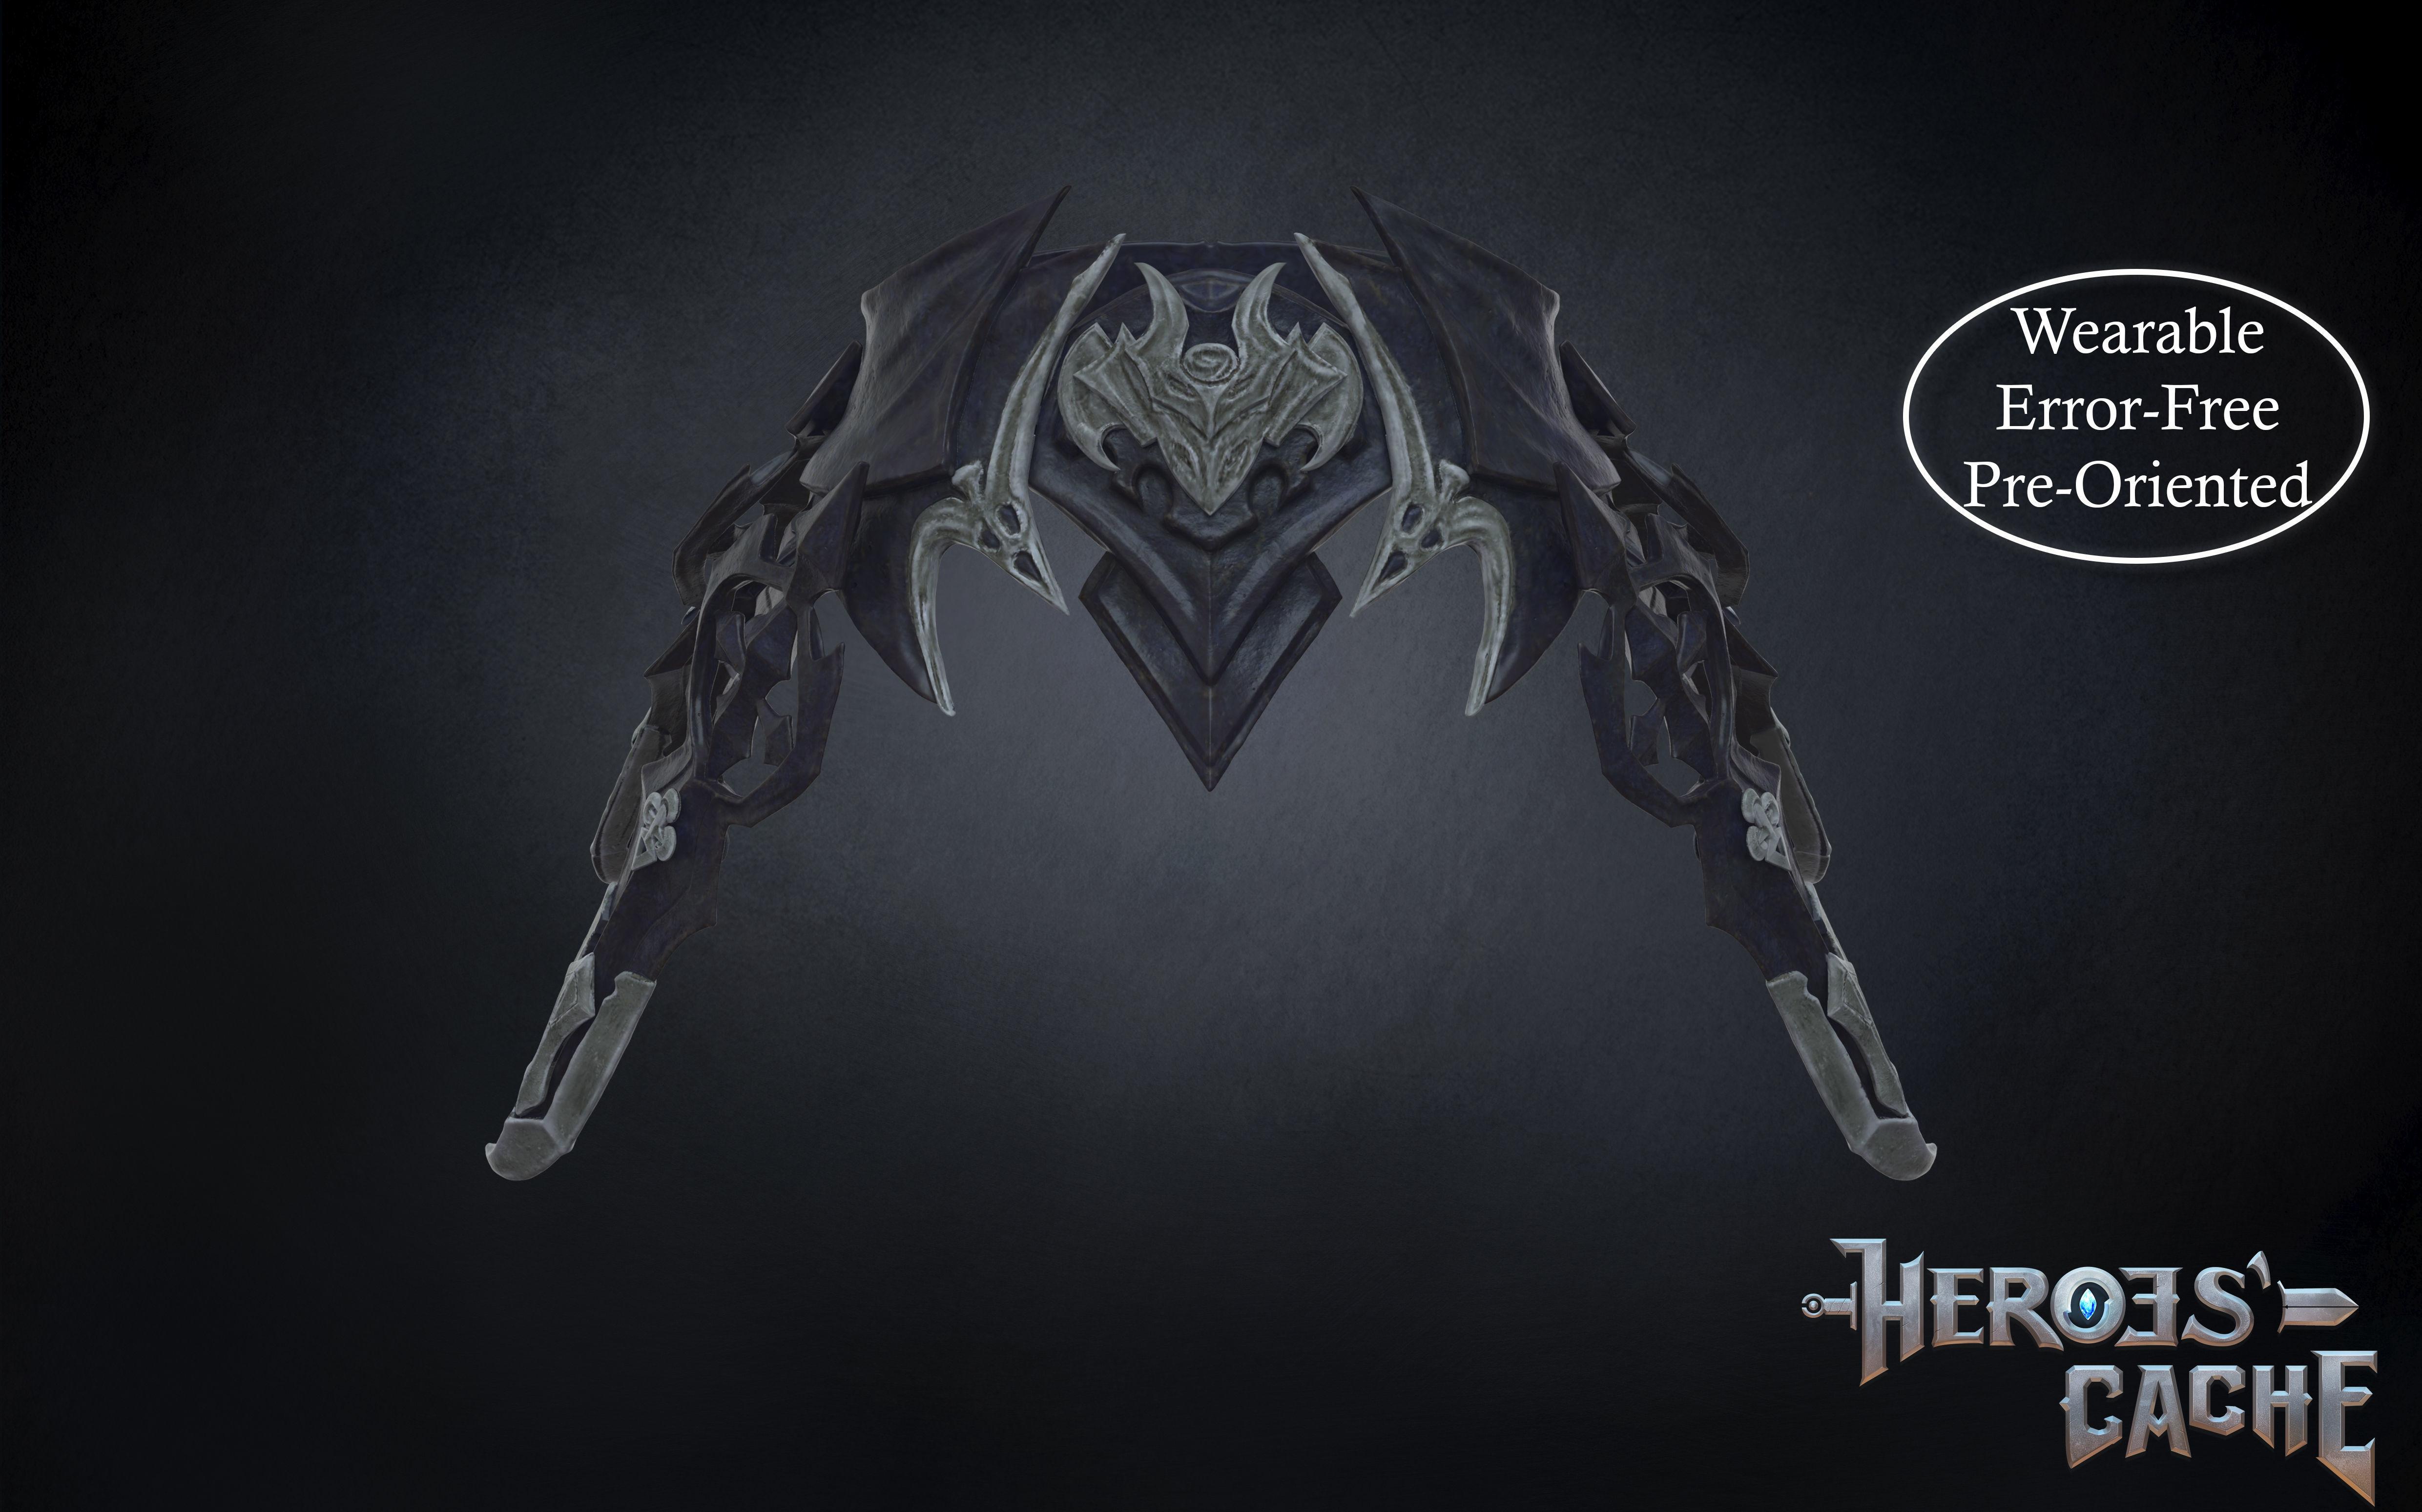 Final Fantasy XIV - Drachen Armor - Waist